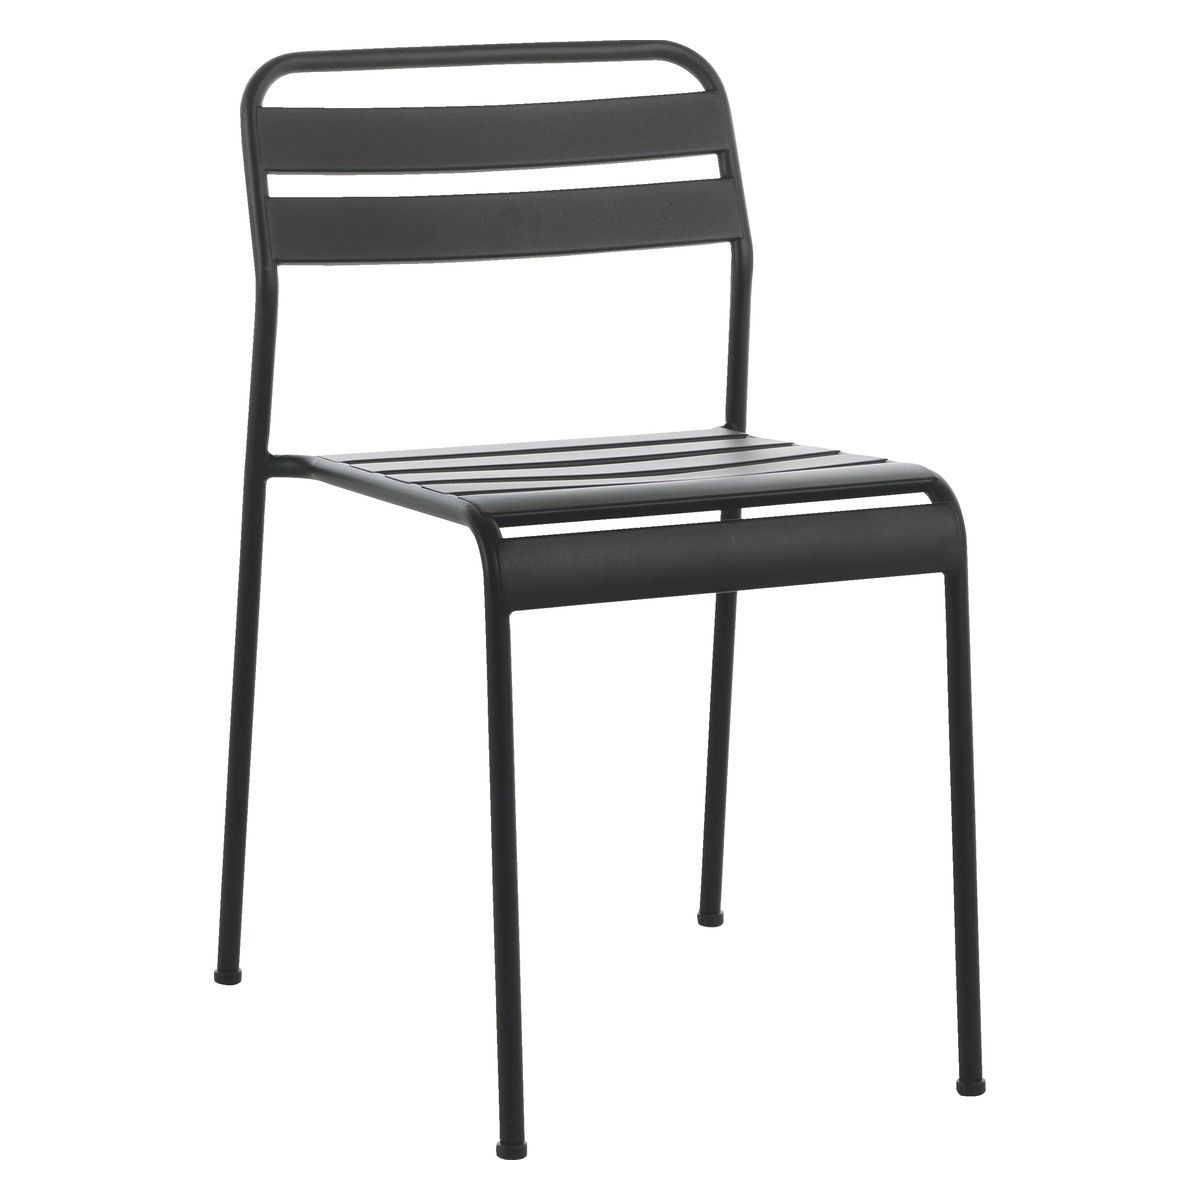 becklen black metal garden chair garden furniture and planters